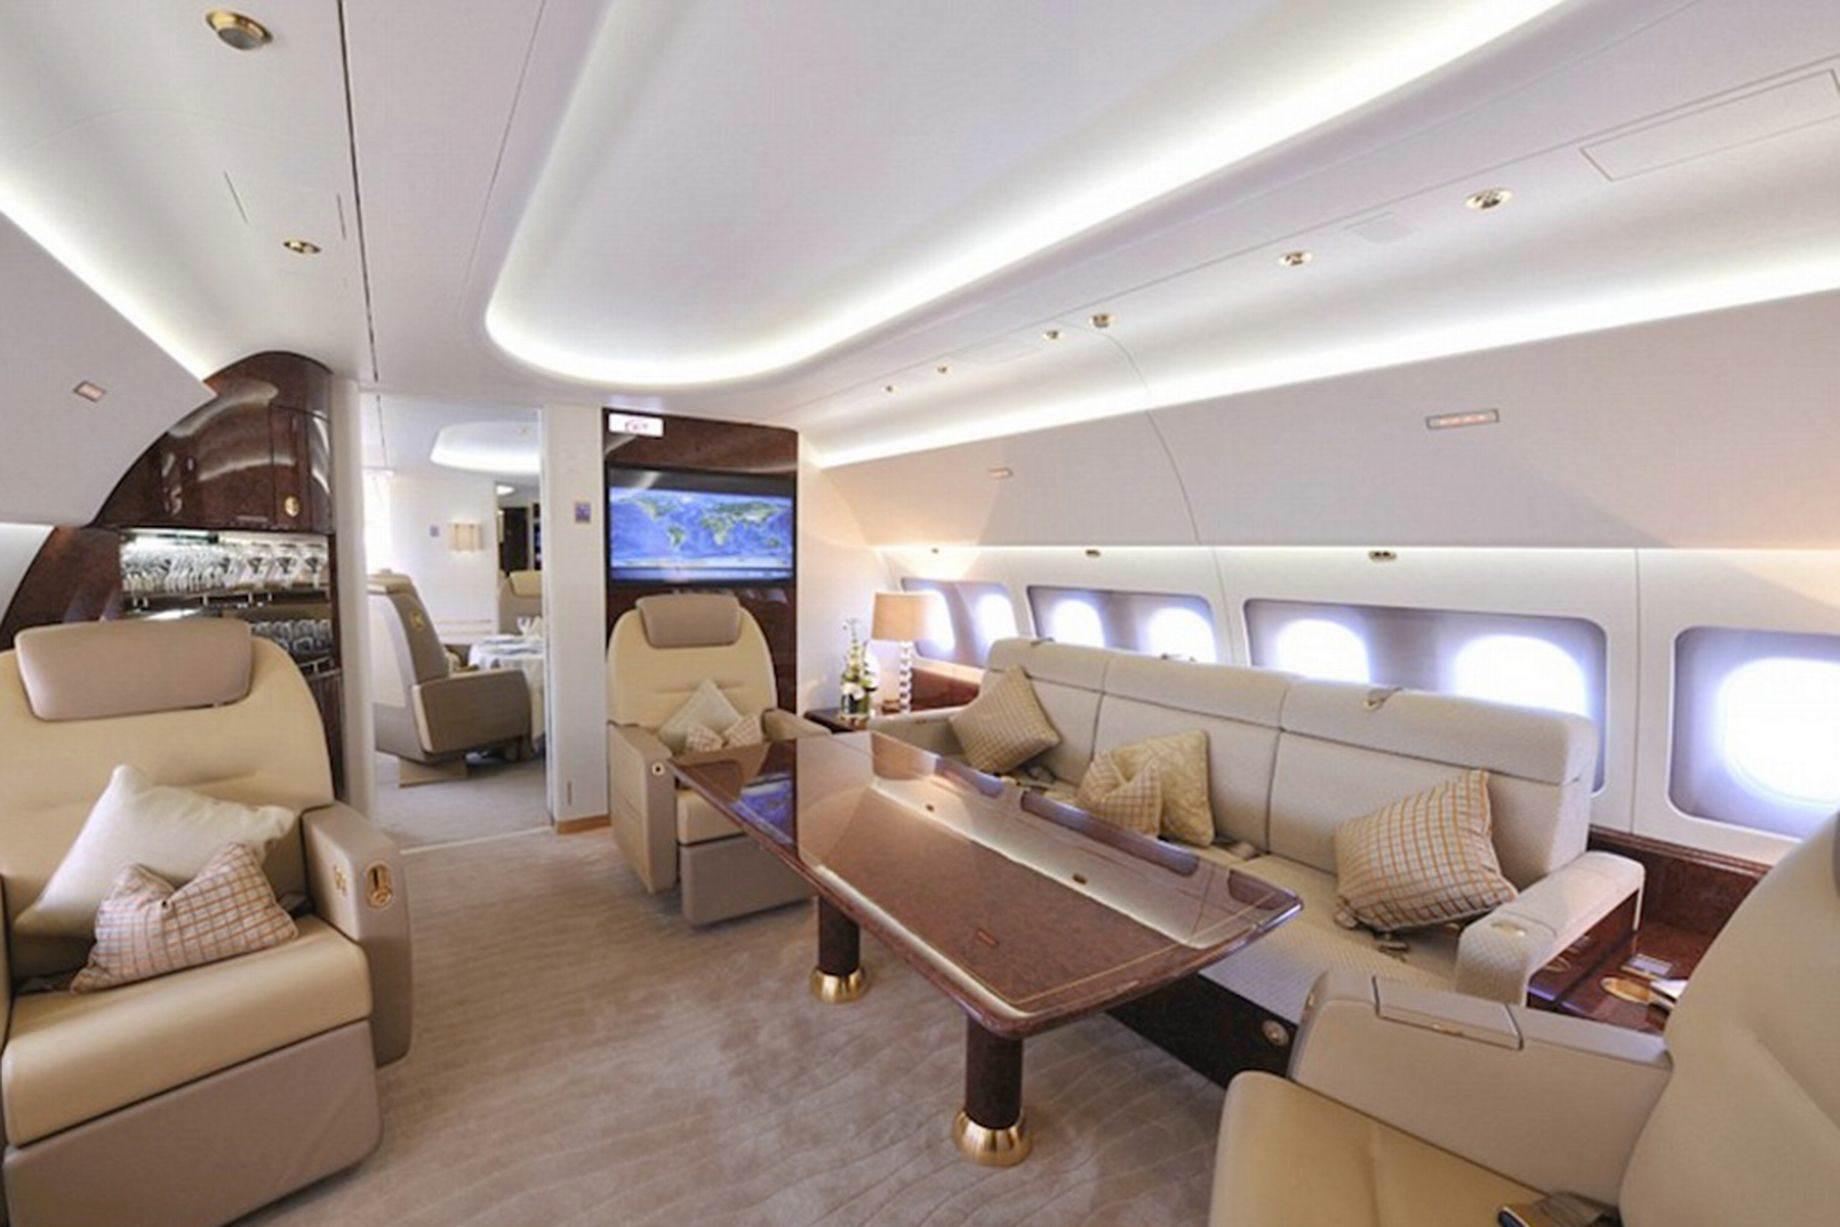 Prince-Charles-private-jet-1